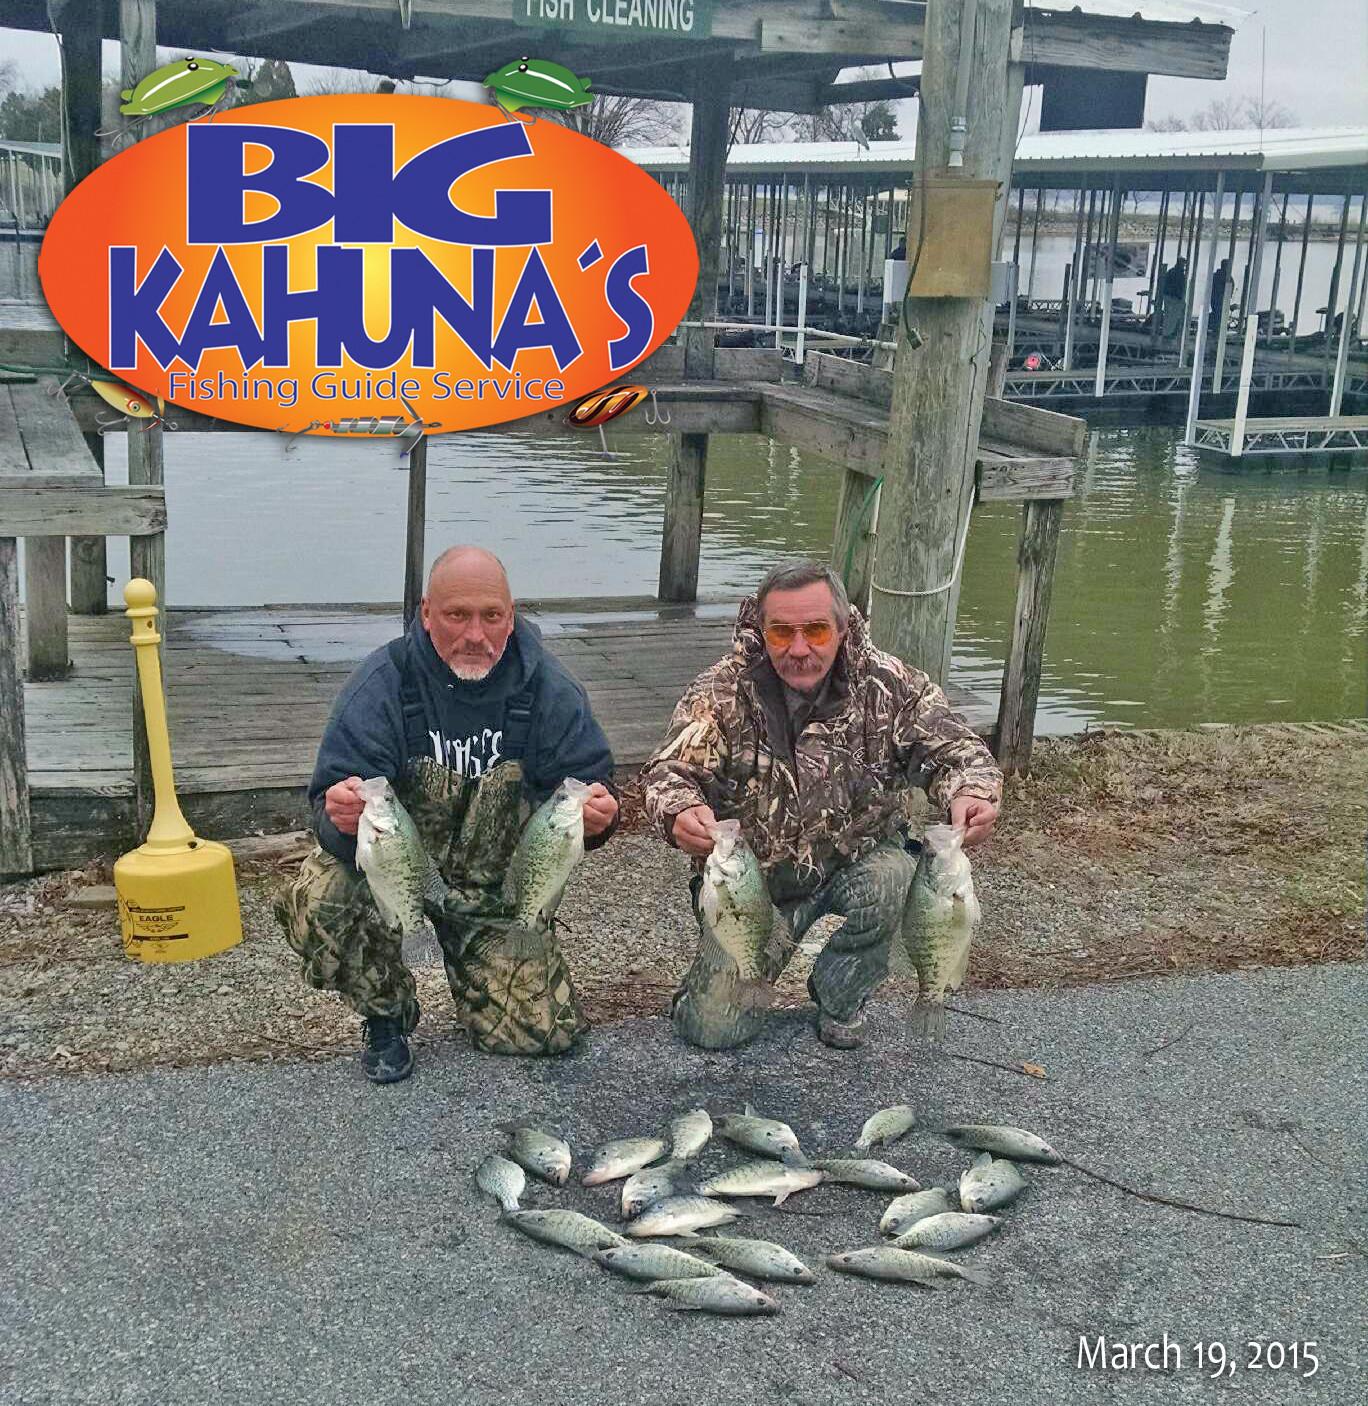 Moors Resort & Marina: Big Kahuna Guided Fishing Trip